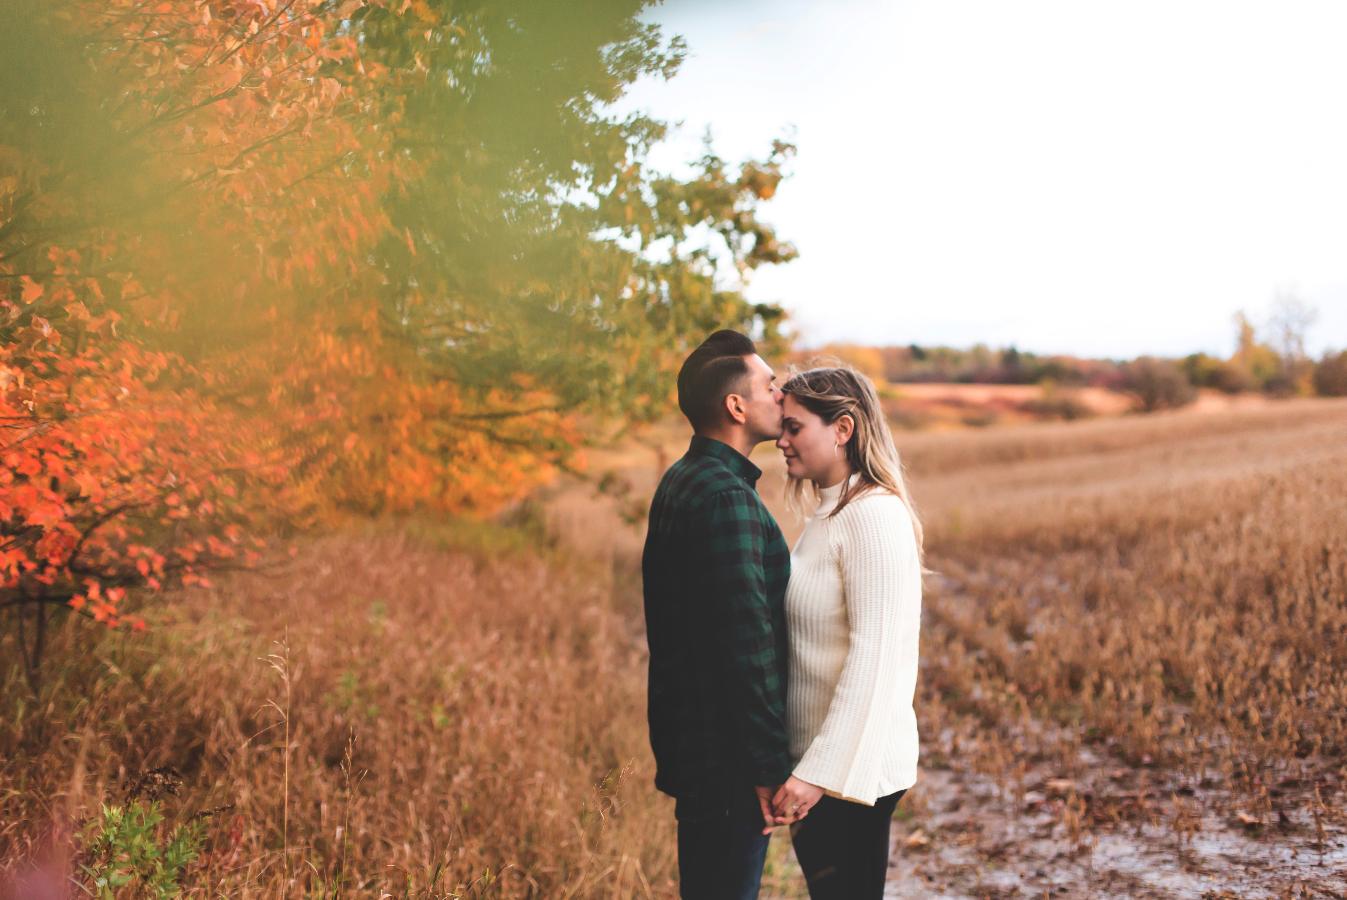 Engagement-Photography-Bruce-Trail-Rain-Hamilton-Burlington-Oakville-Niagara-Toronto-Wedding-Photographer-Photo-Image-17.png